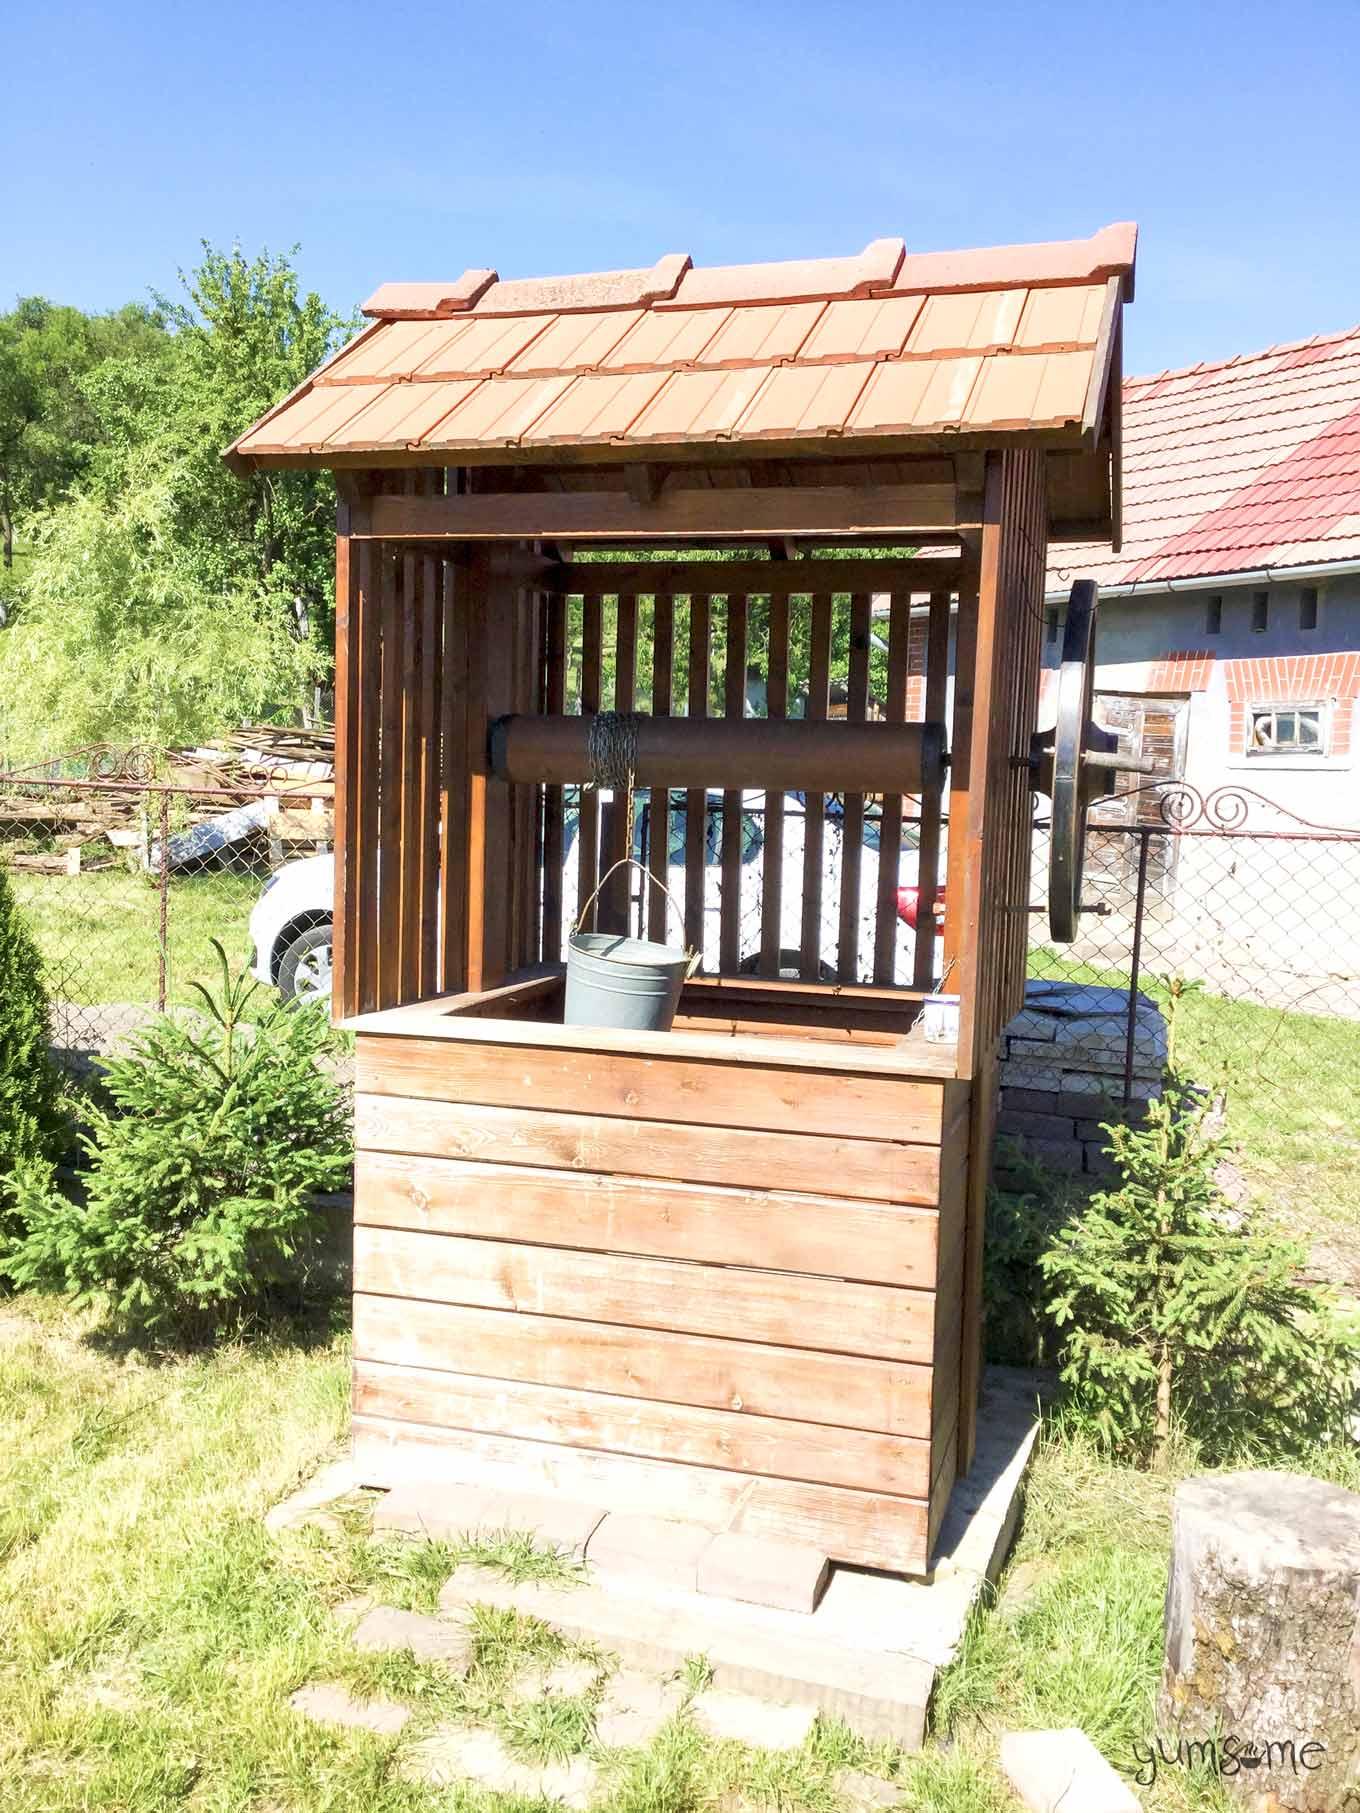 Baita's communal well | yumsome.com